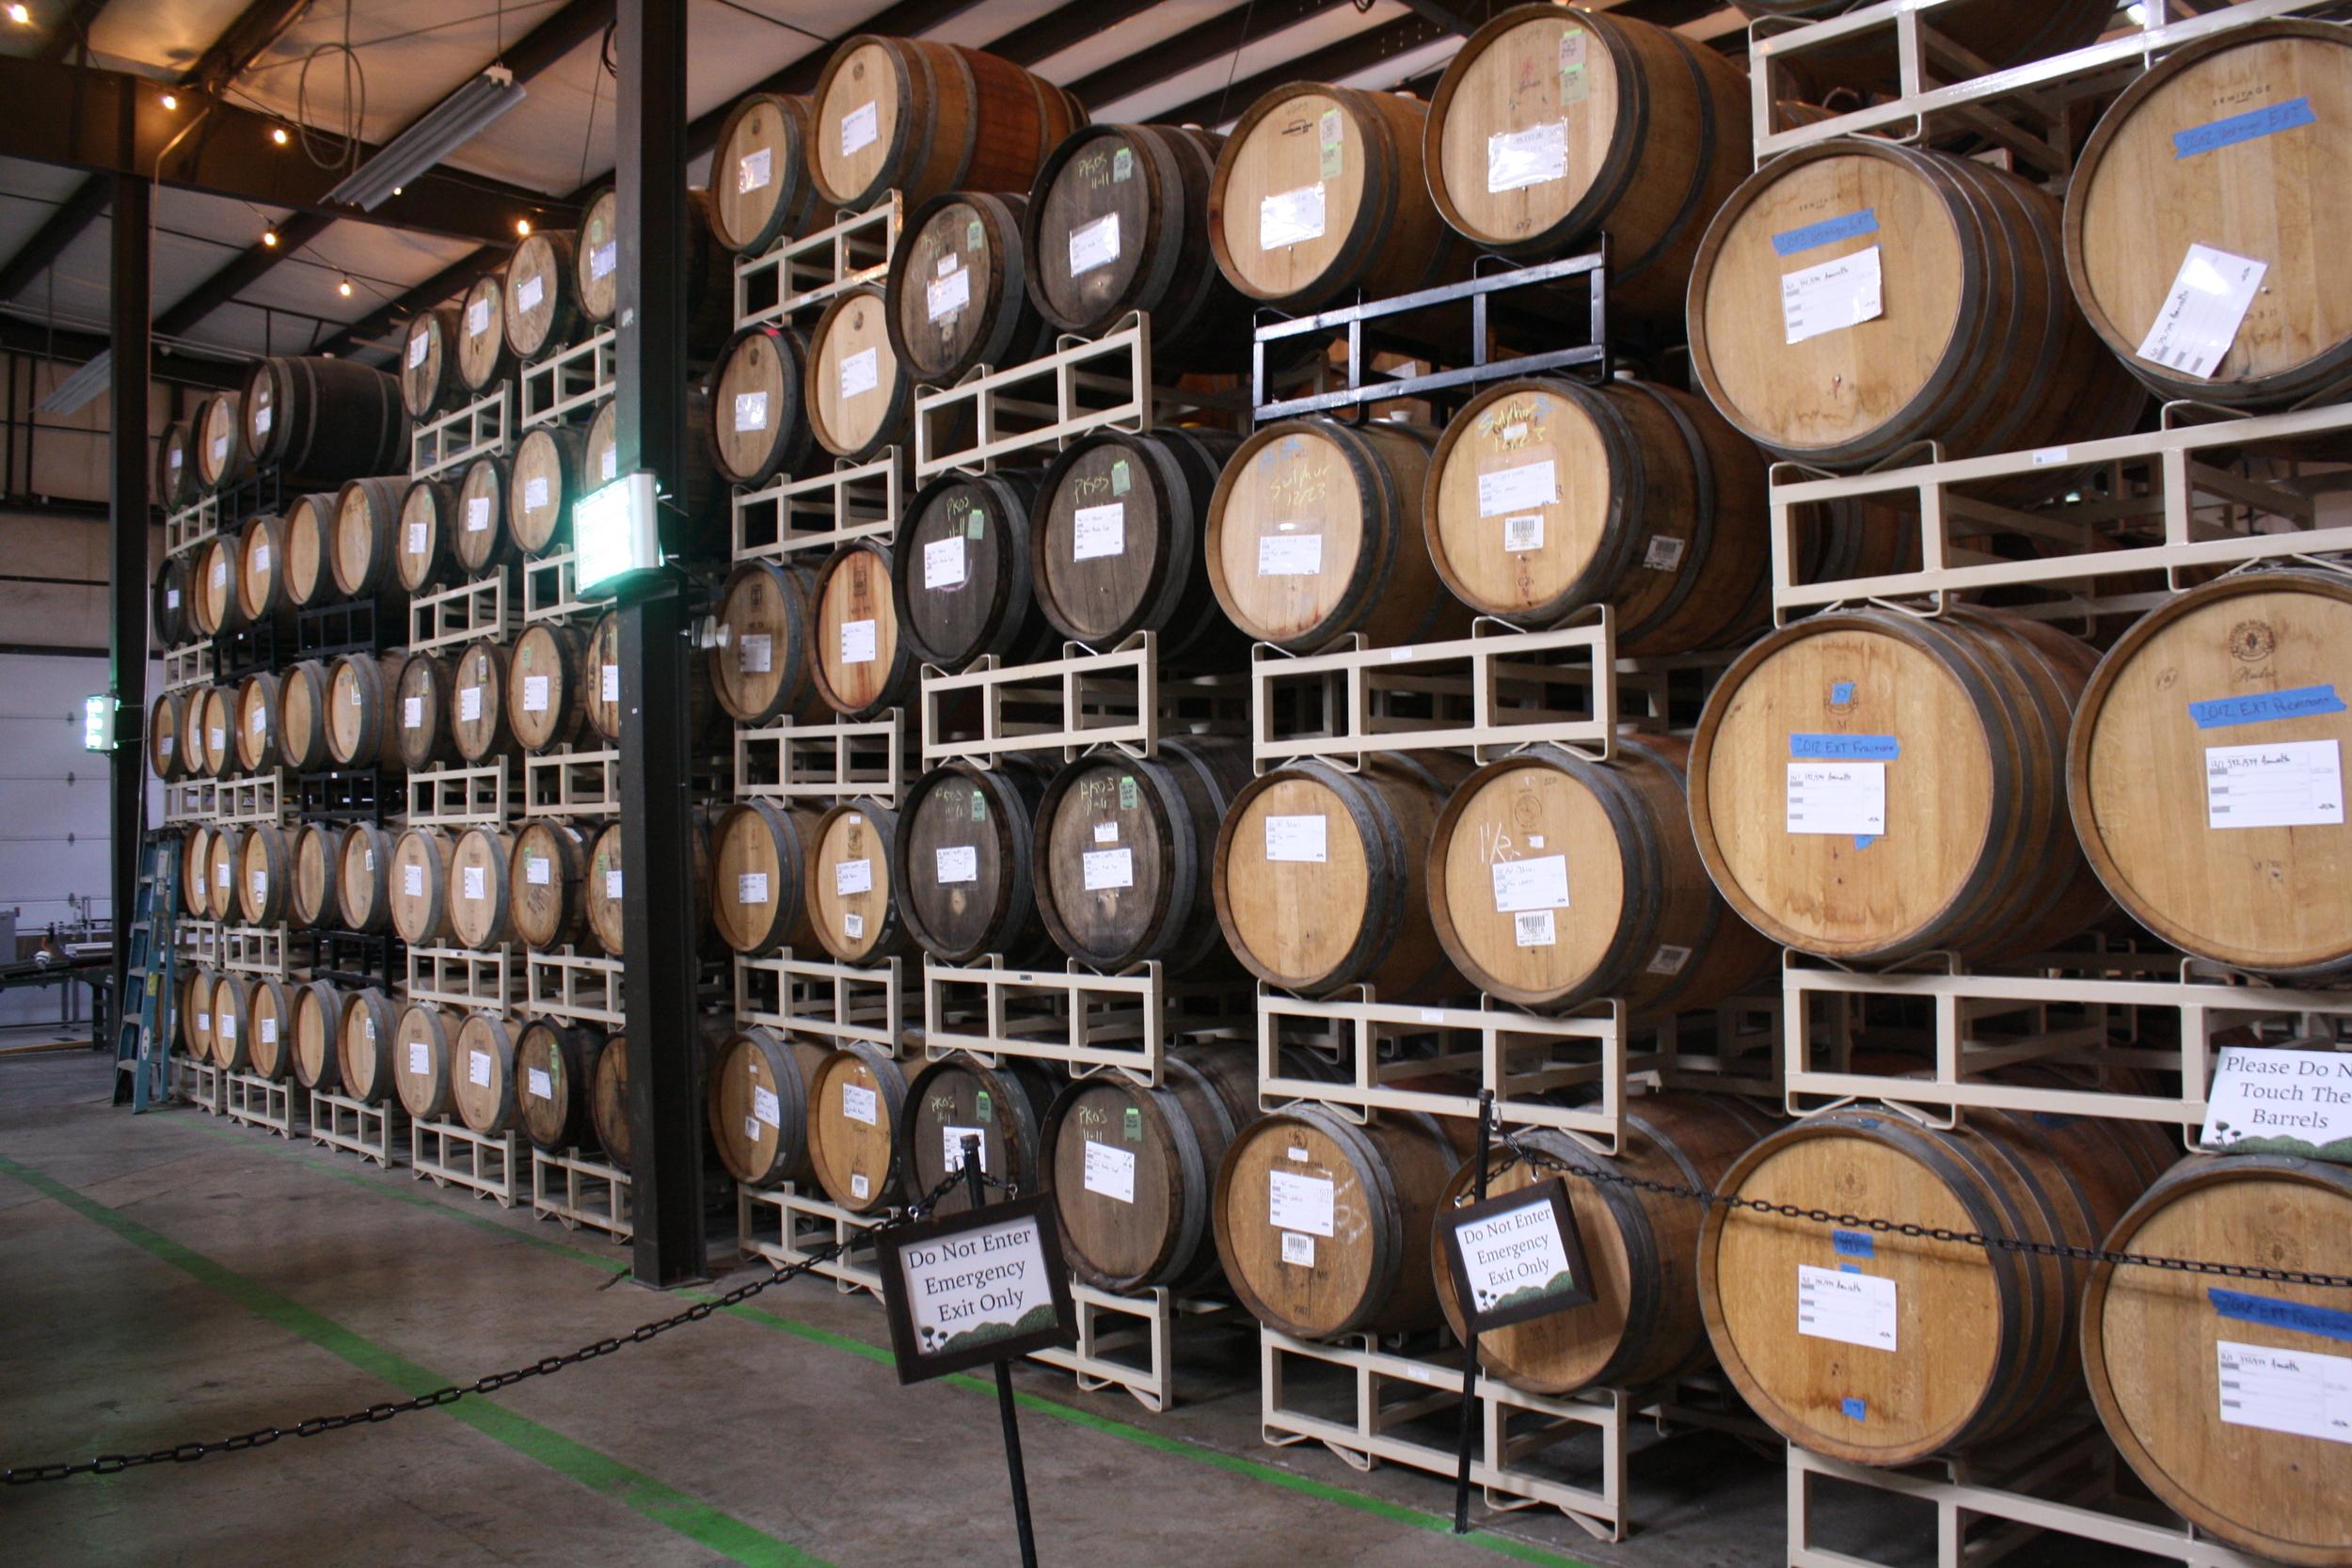 Funky beers aging in barrels at the Funkatorium.